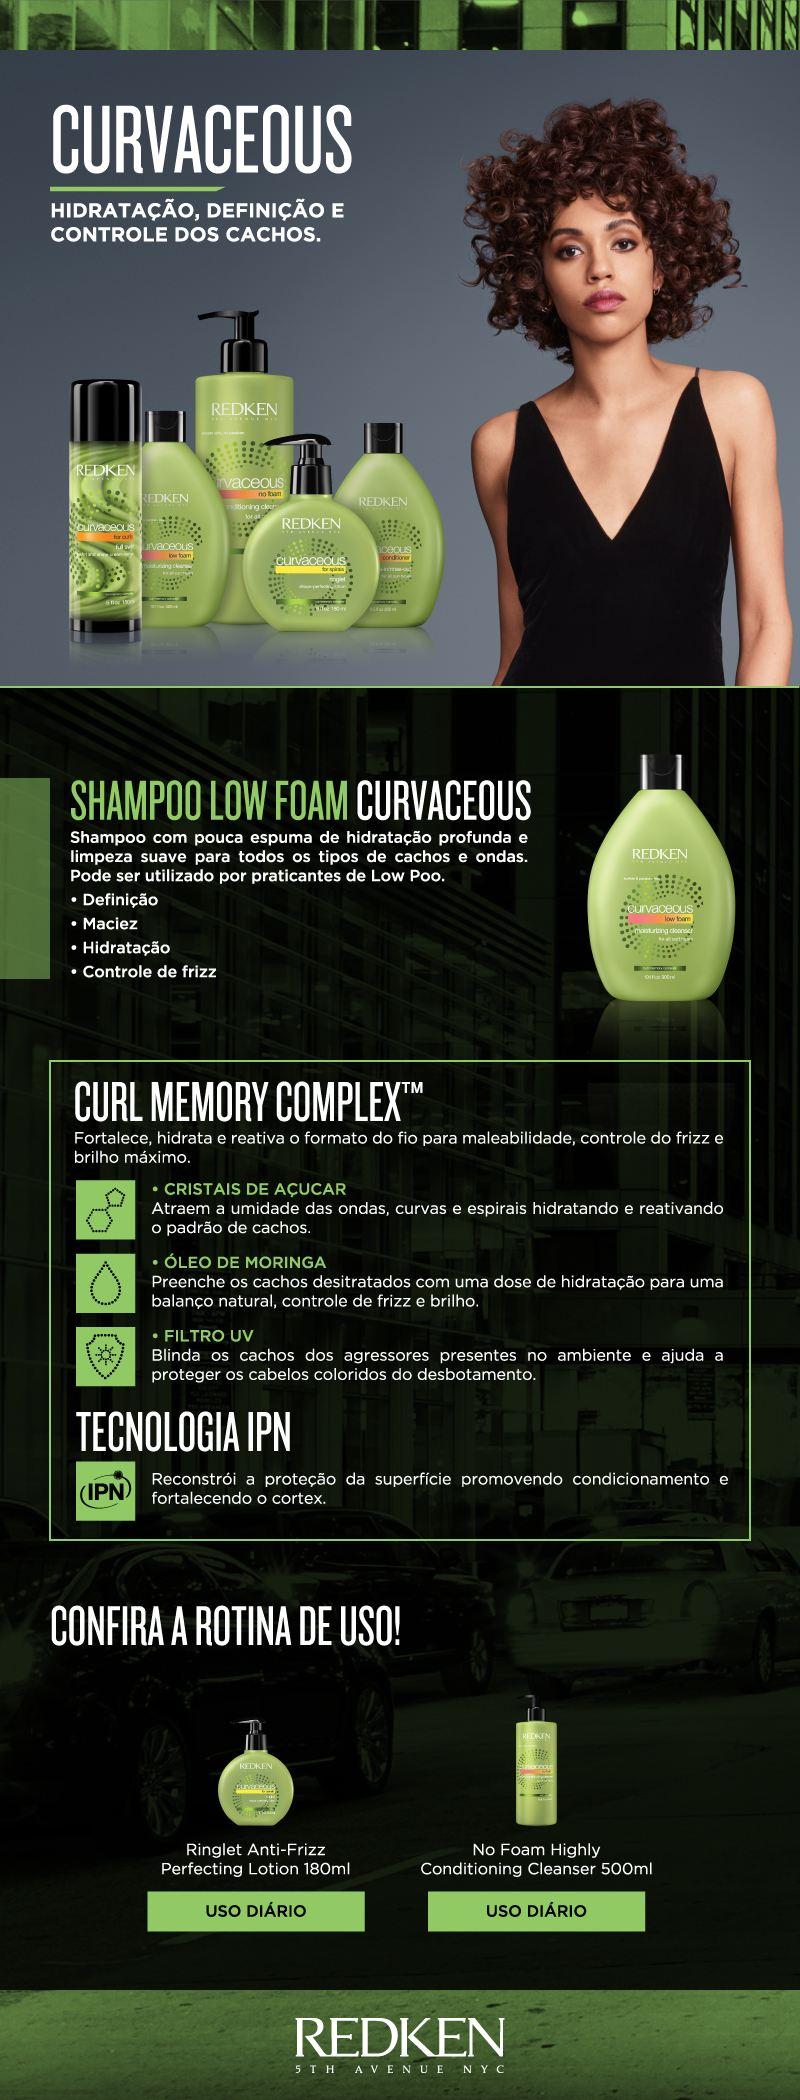 redken curvaceous shampoo